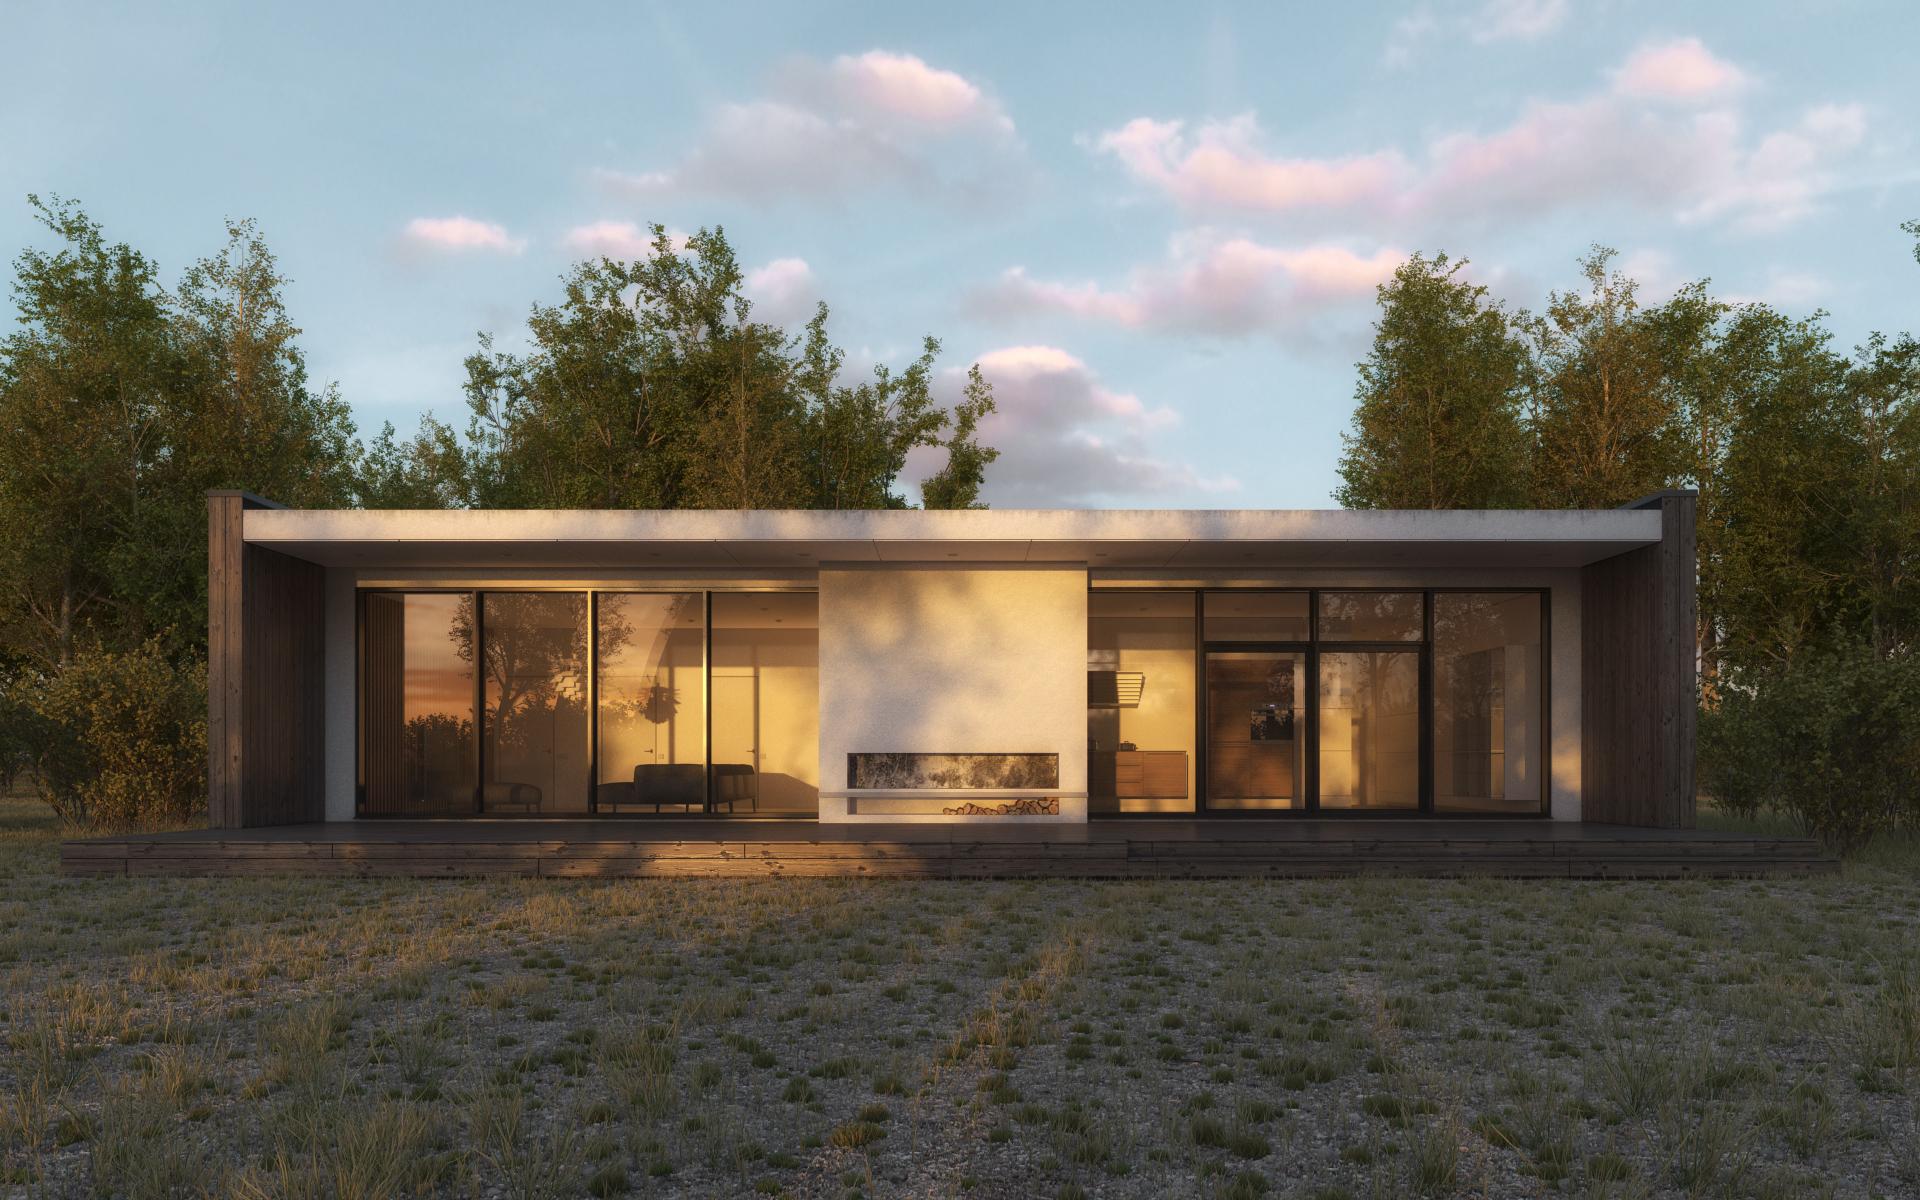 3d Brick Wallpaper Philippines Scandinavian Summer House By 3dstudija Showme Design